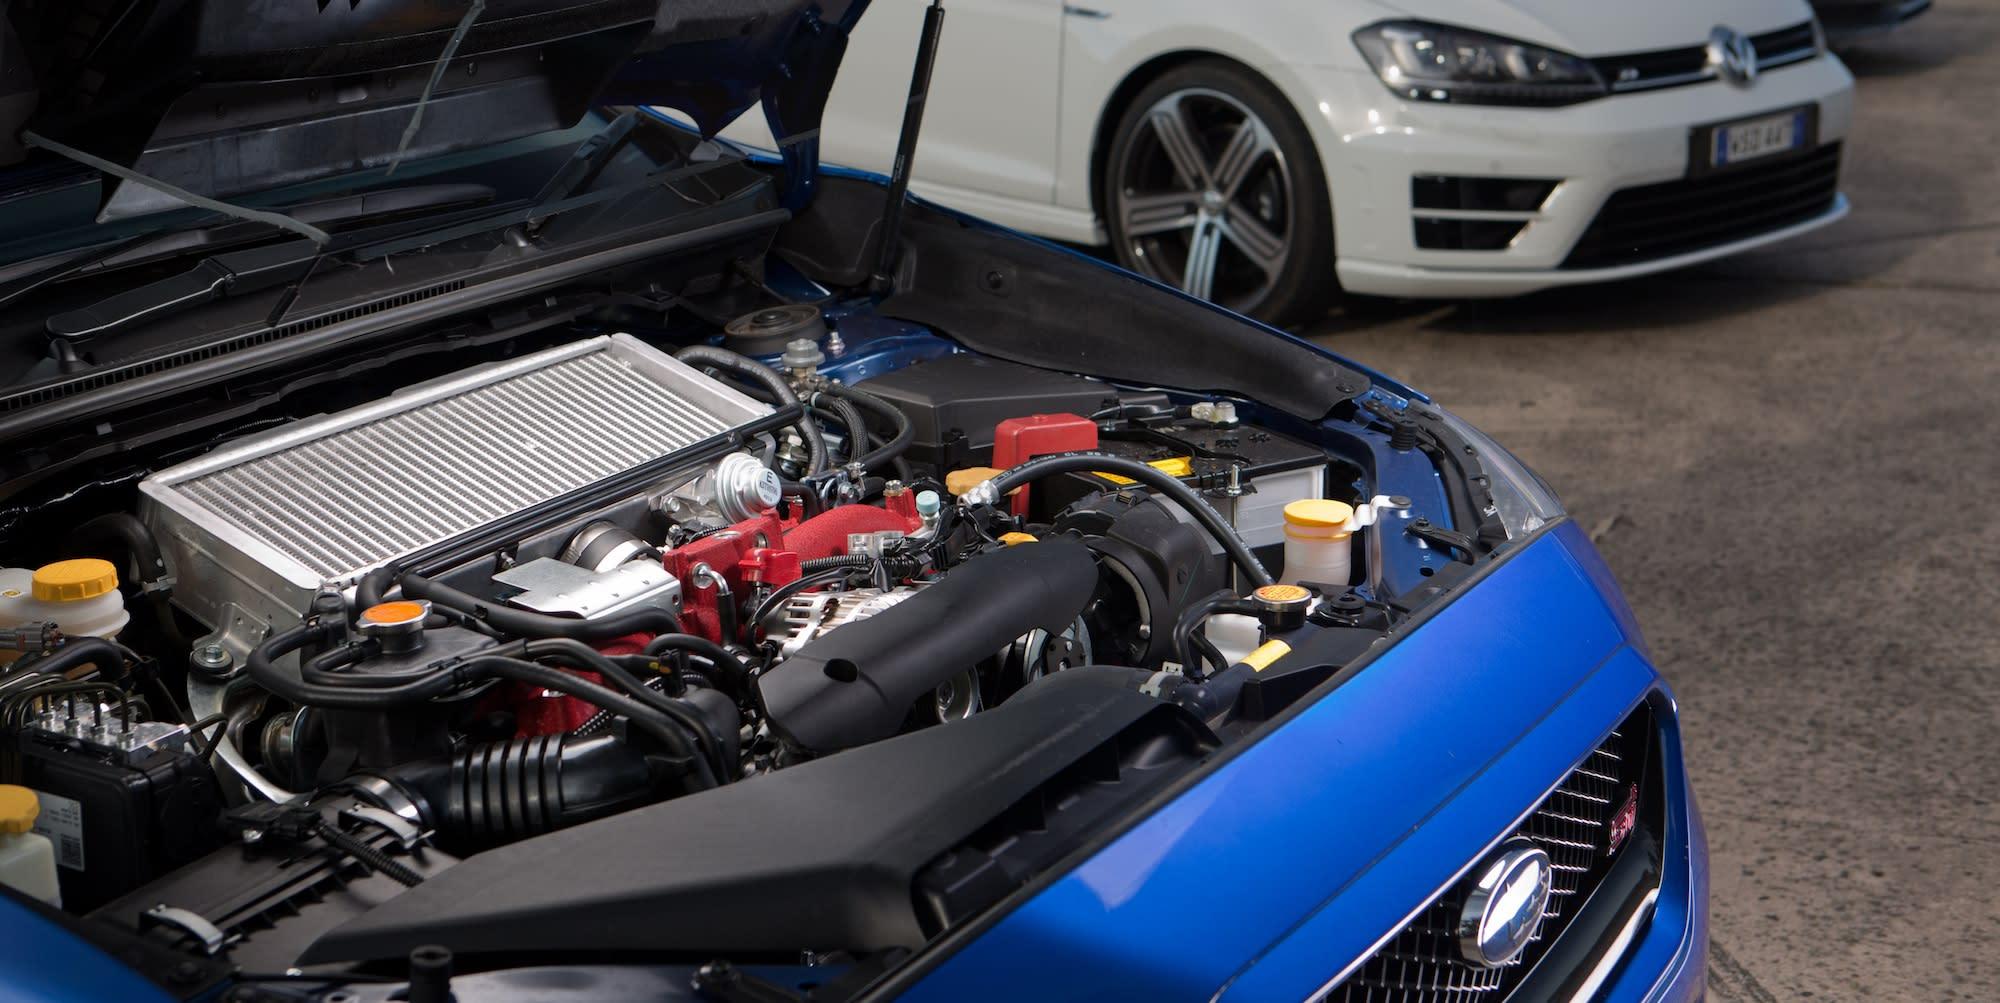 Subaru WRX STI Audi S3 Volkswagen Golf R 27